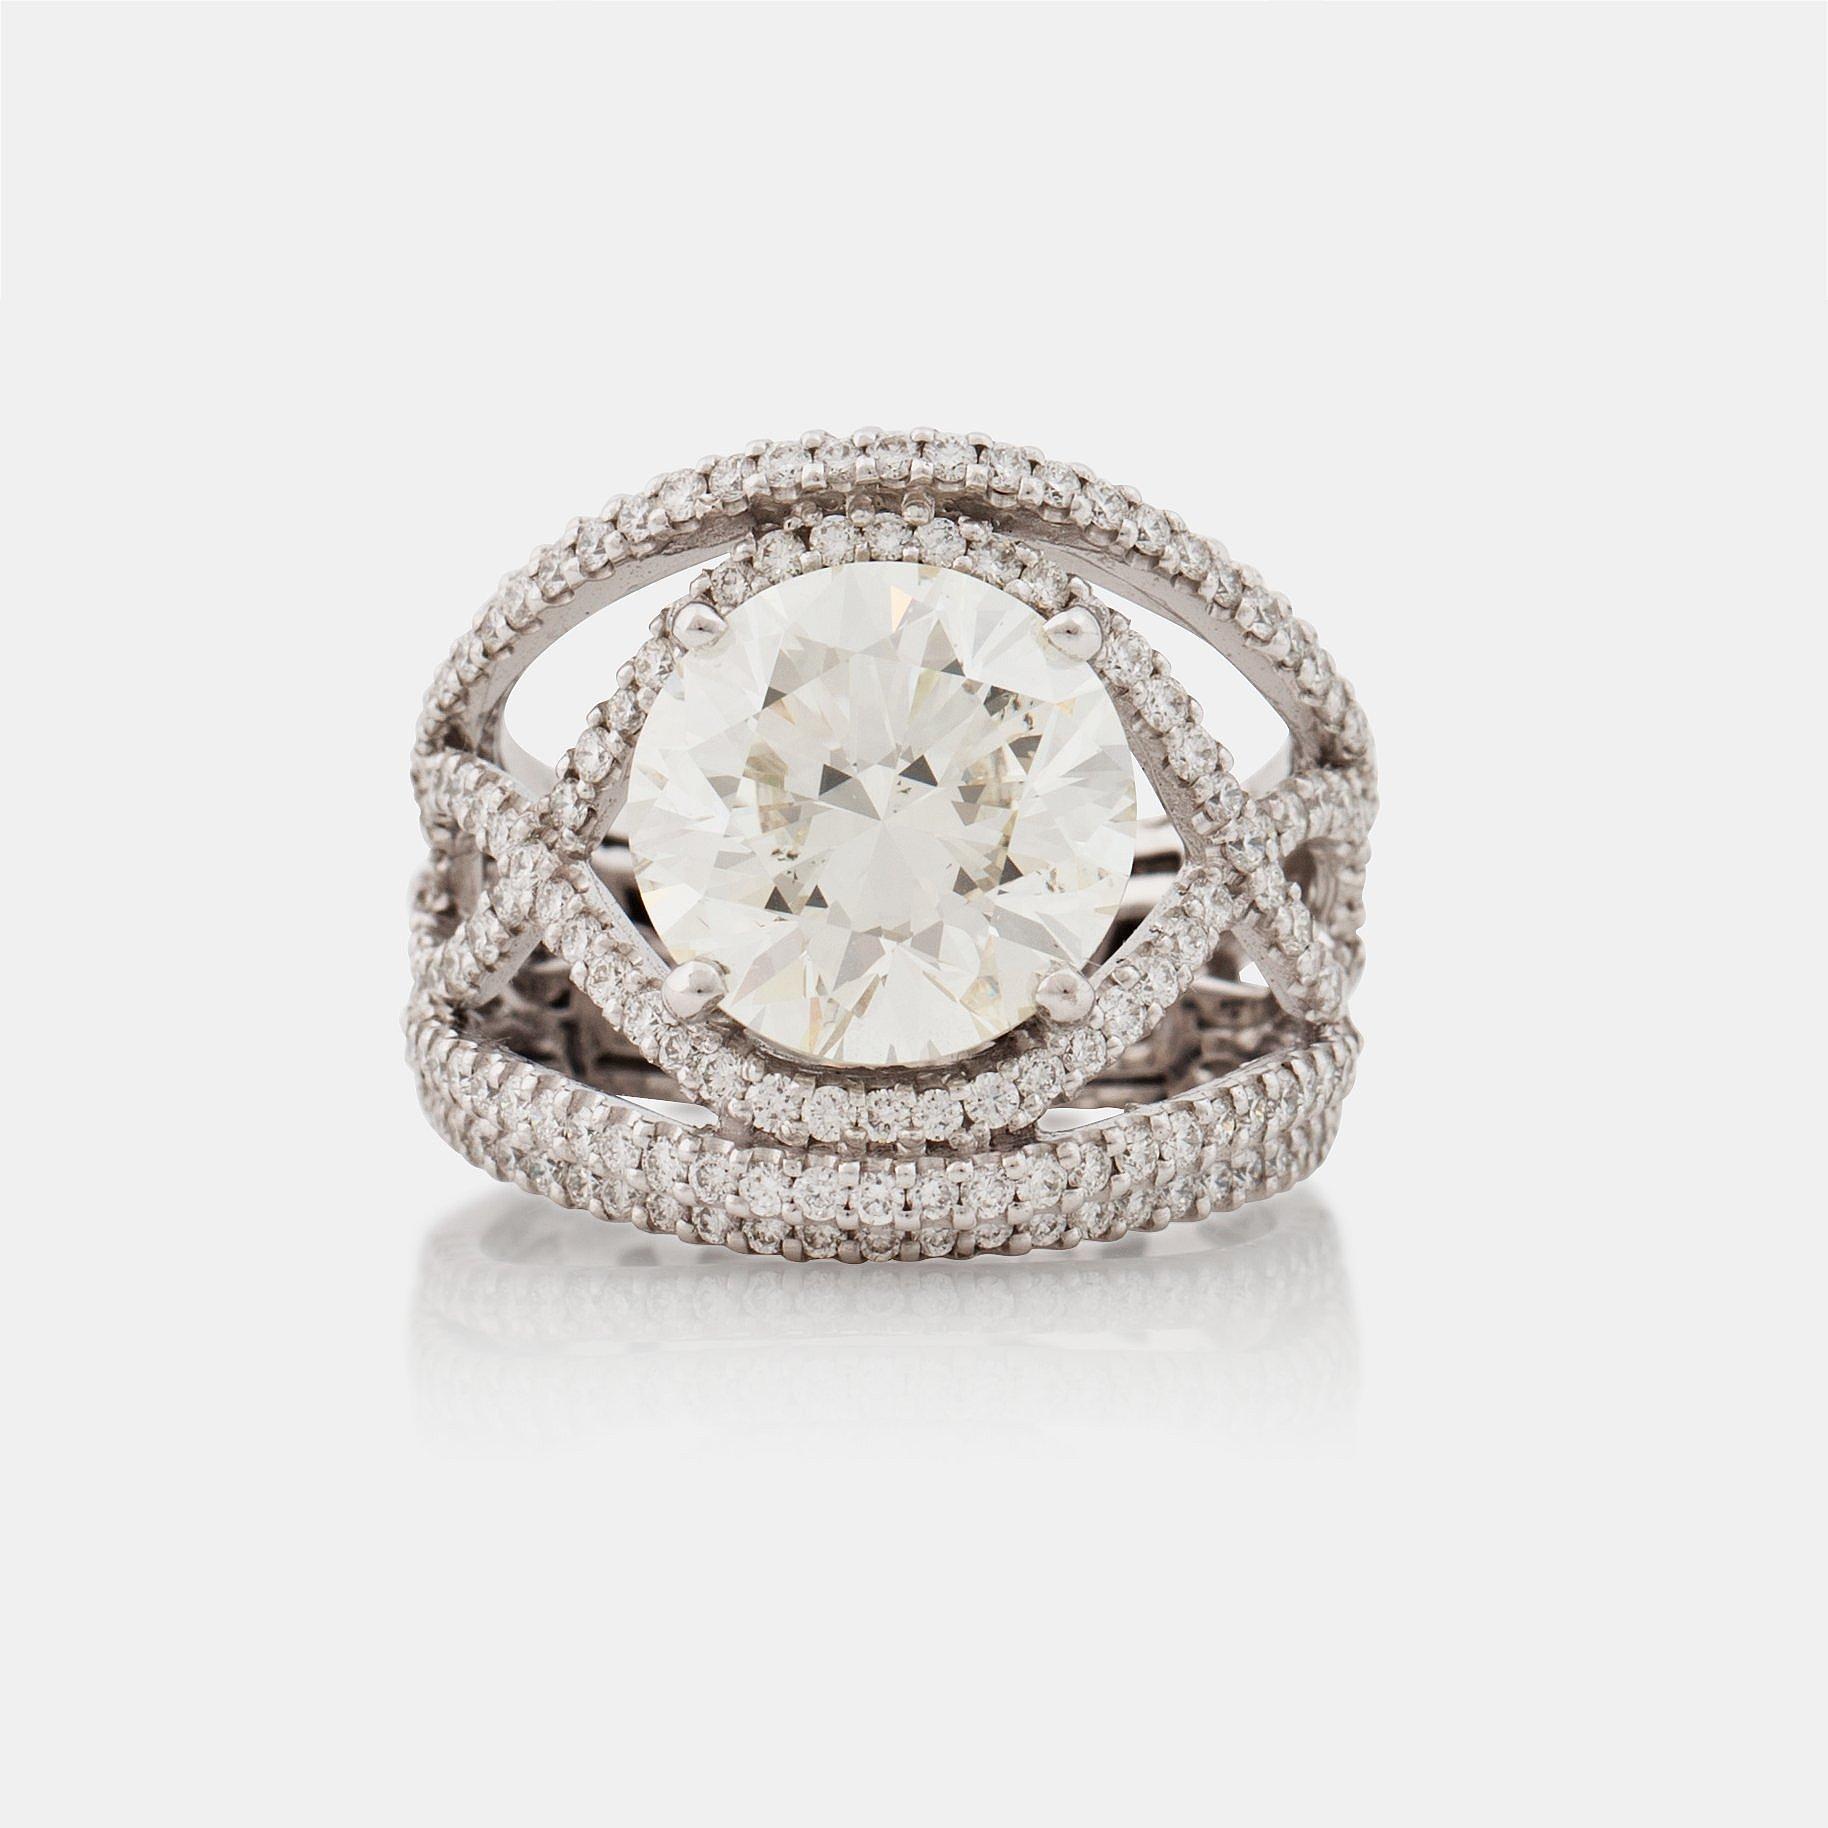 A Brilliant Cut Diamond Ring. Total Carat Weight Circa 8